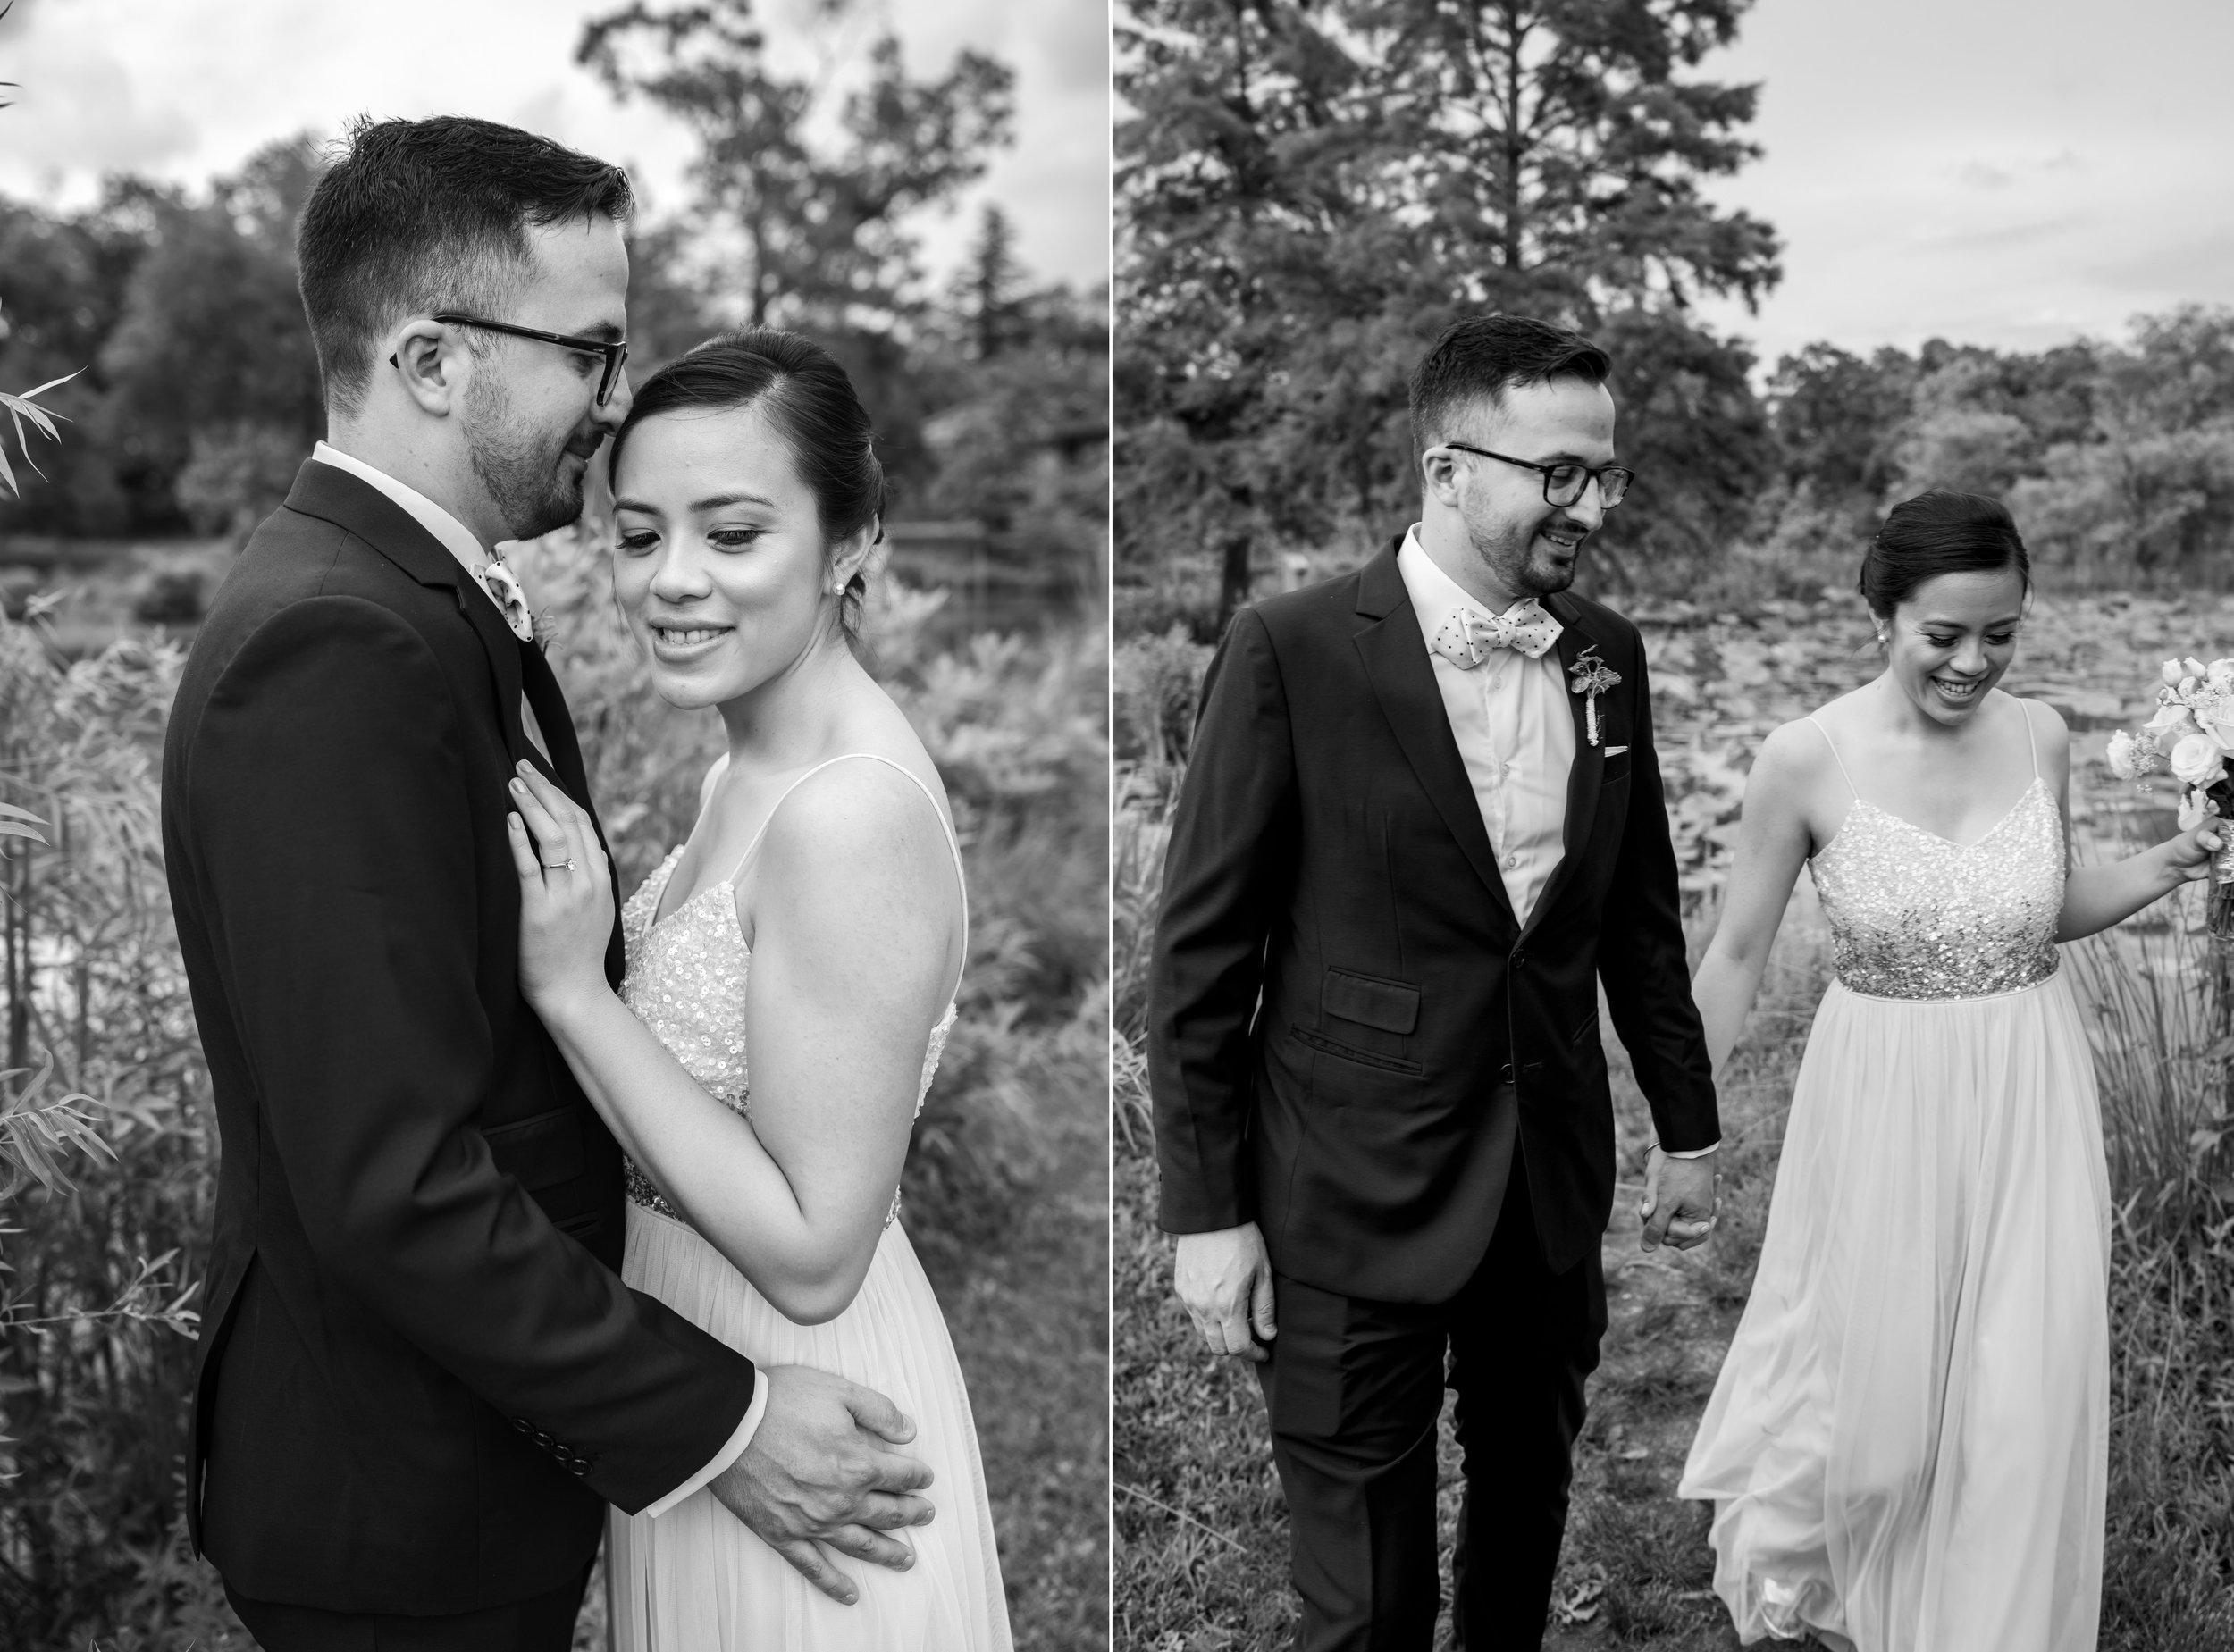 Kenilworth Aquatic Gardens portrait of bride and groom first look